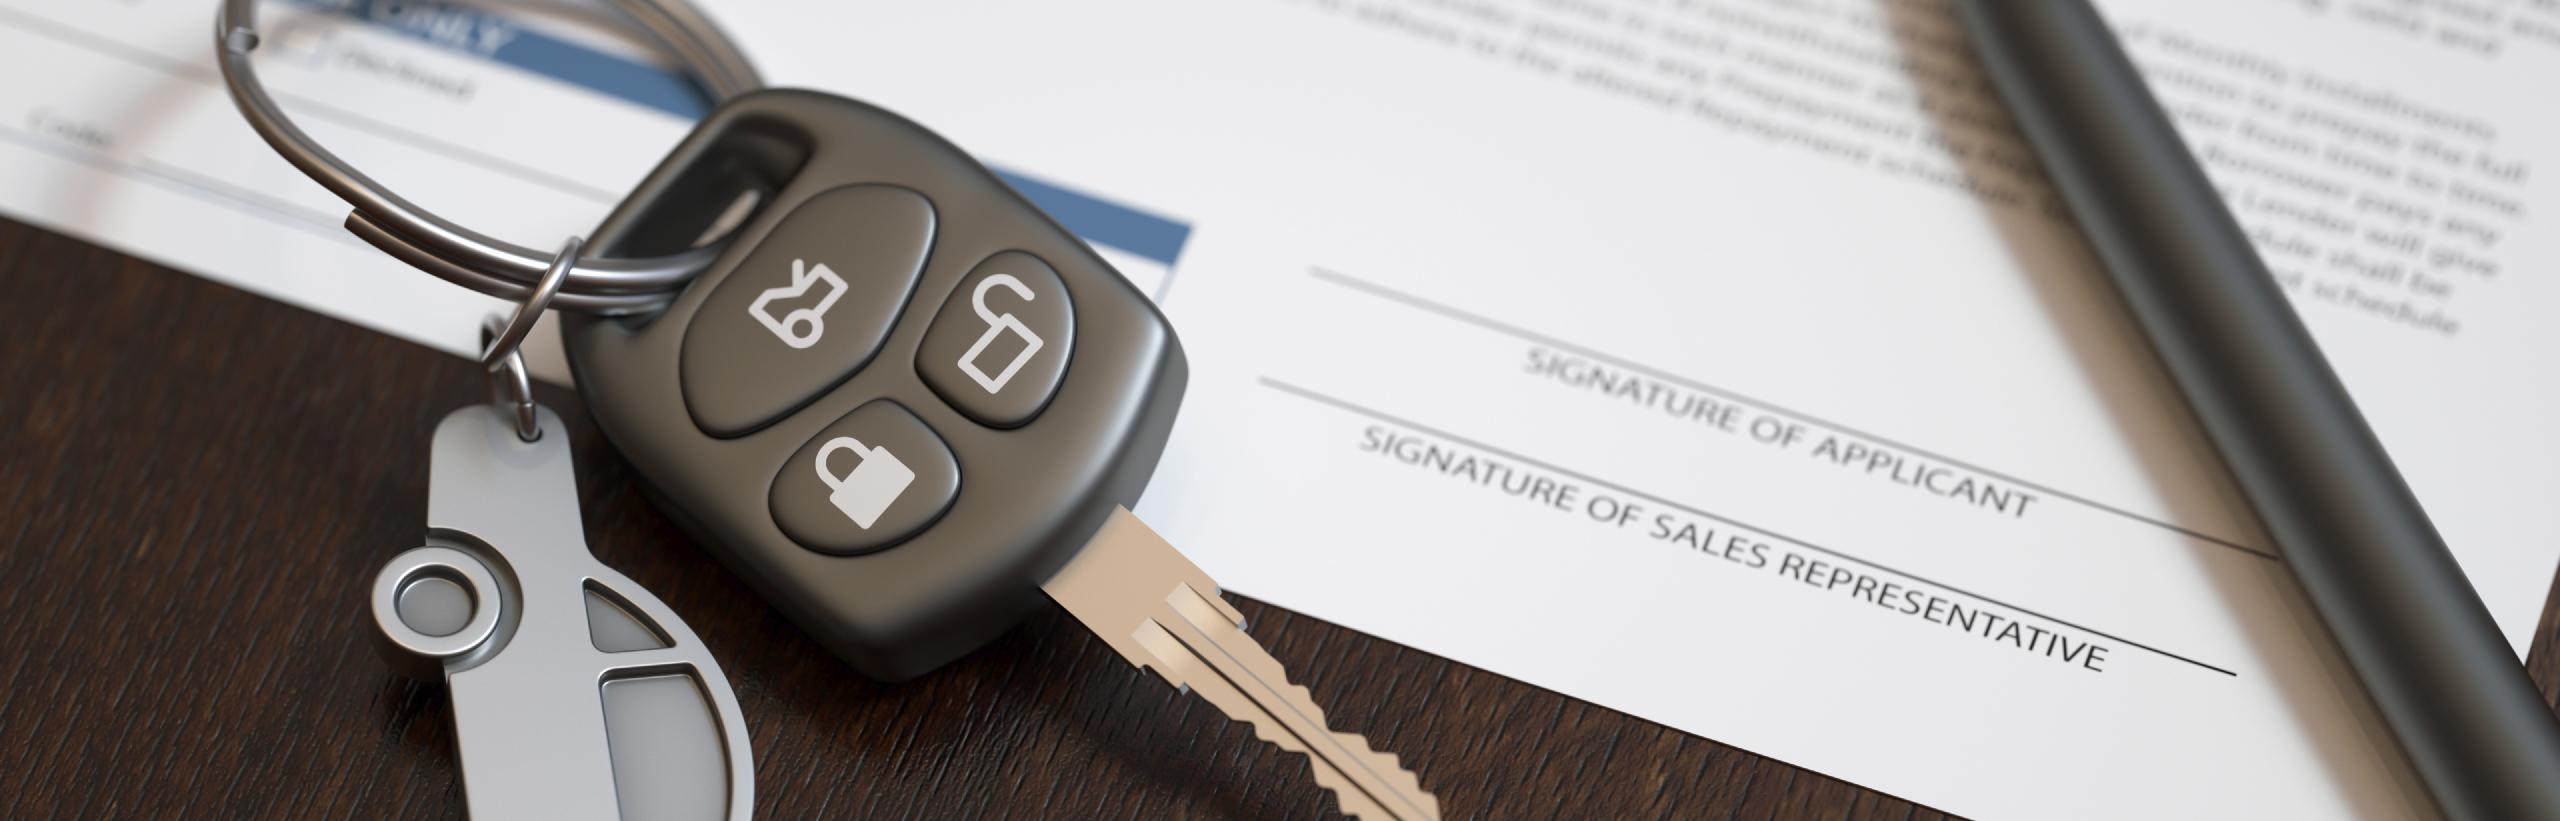 How Do I Finance a Pre-Owned Vehicle?